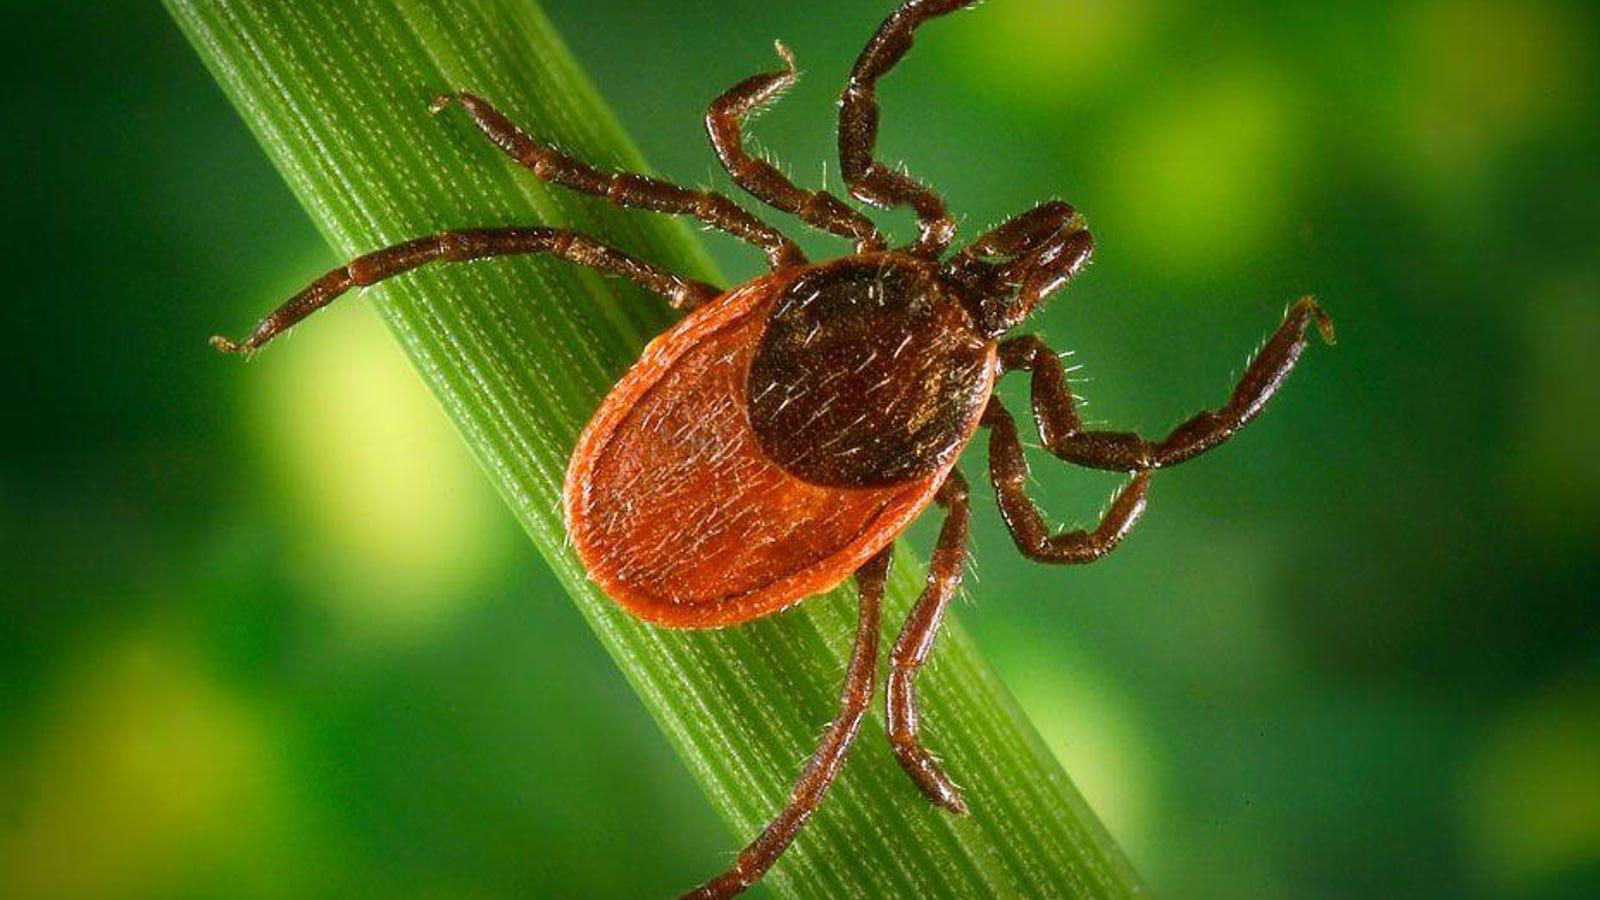 Mild winter, wet 2018 may cause surge in ticks in NJ, Northeast